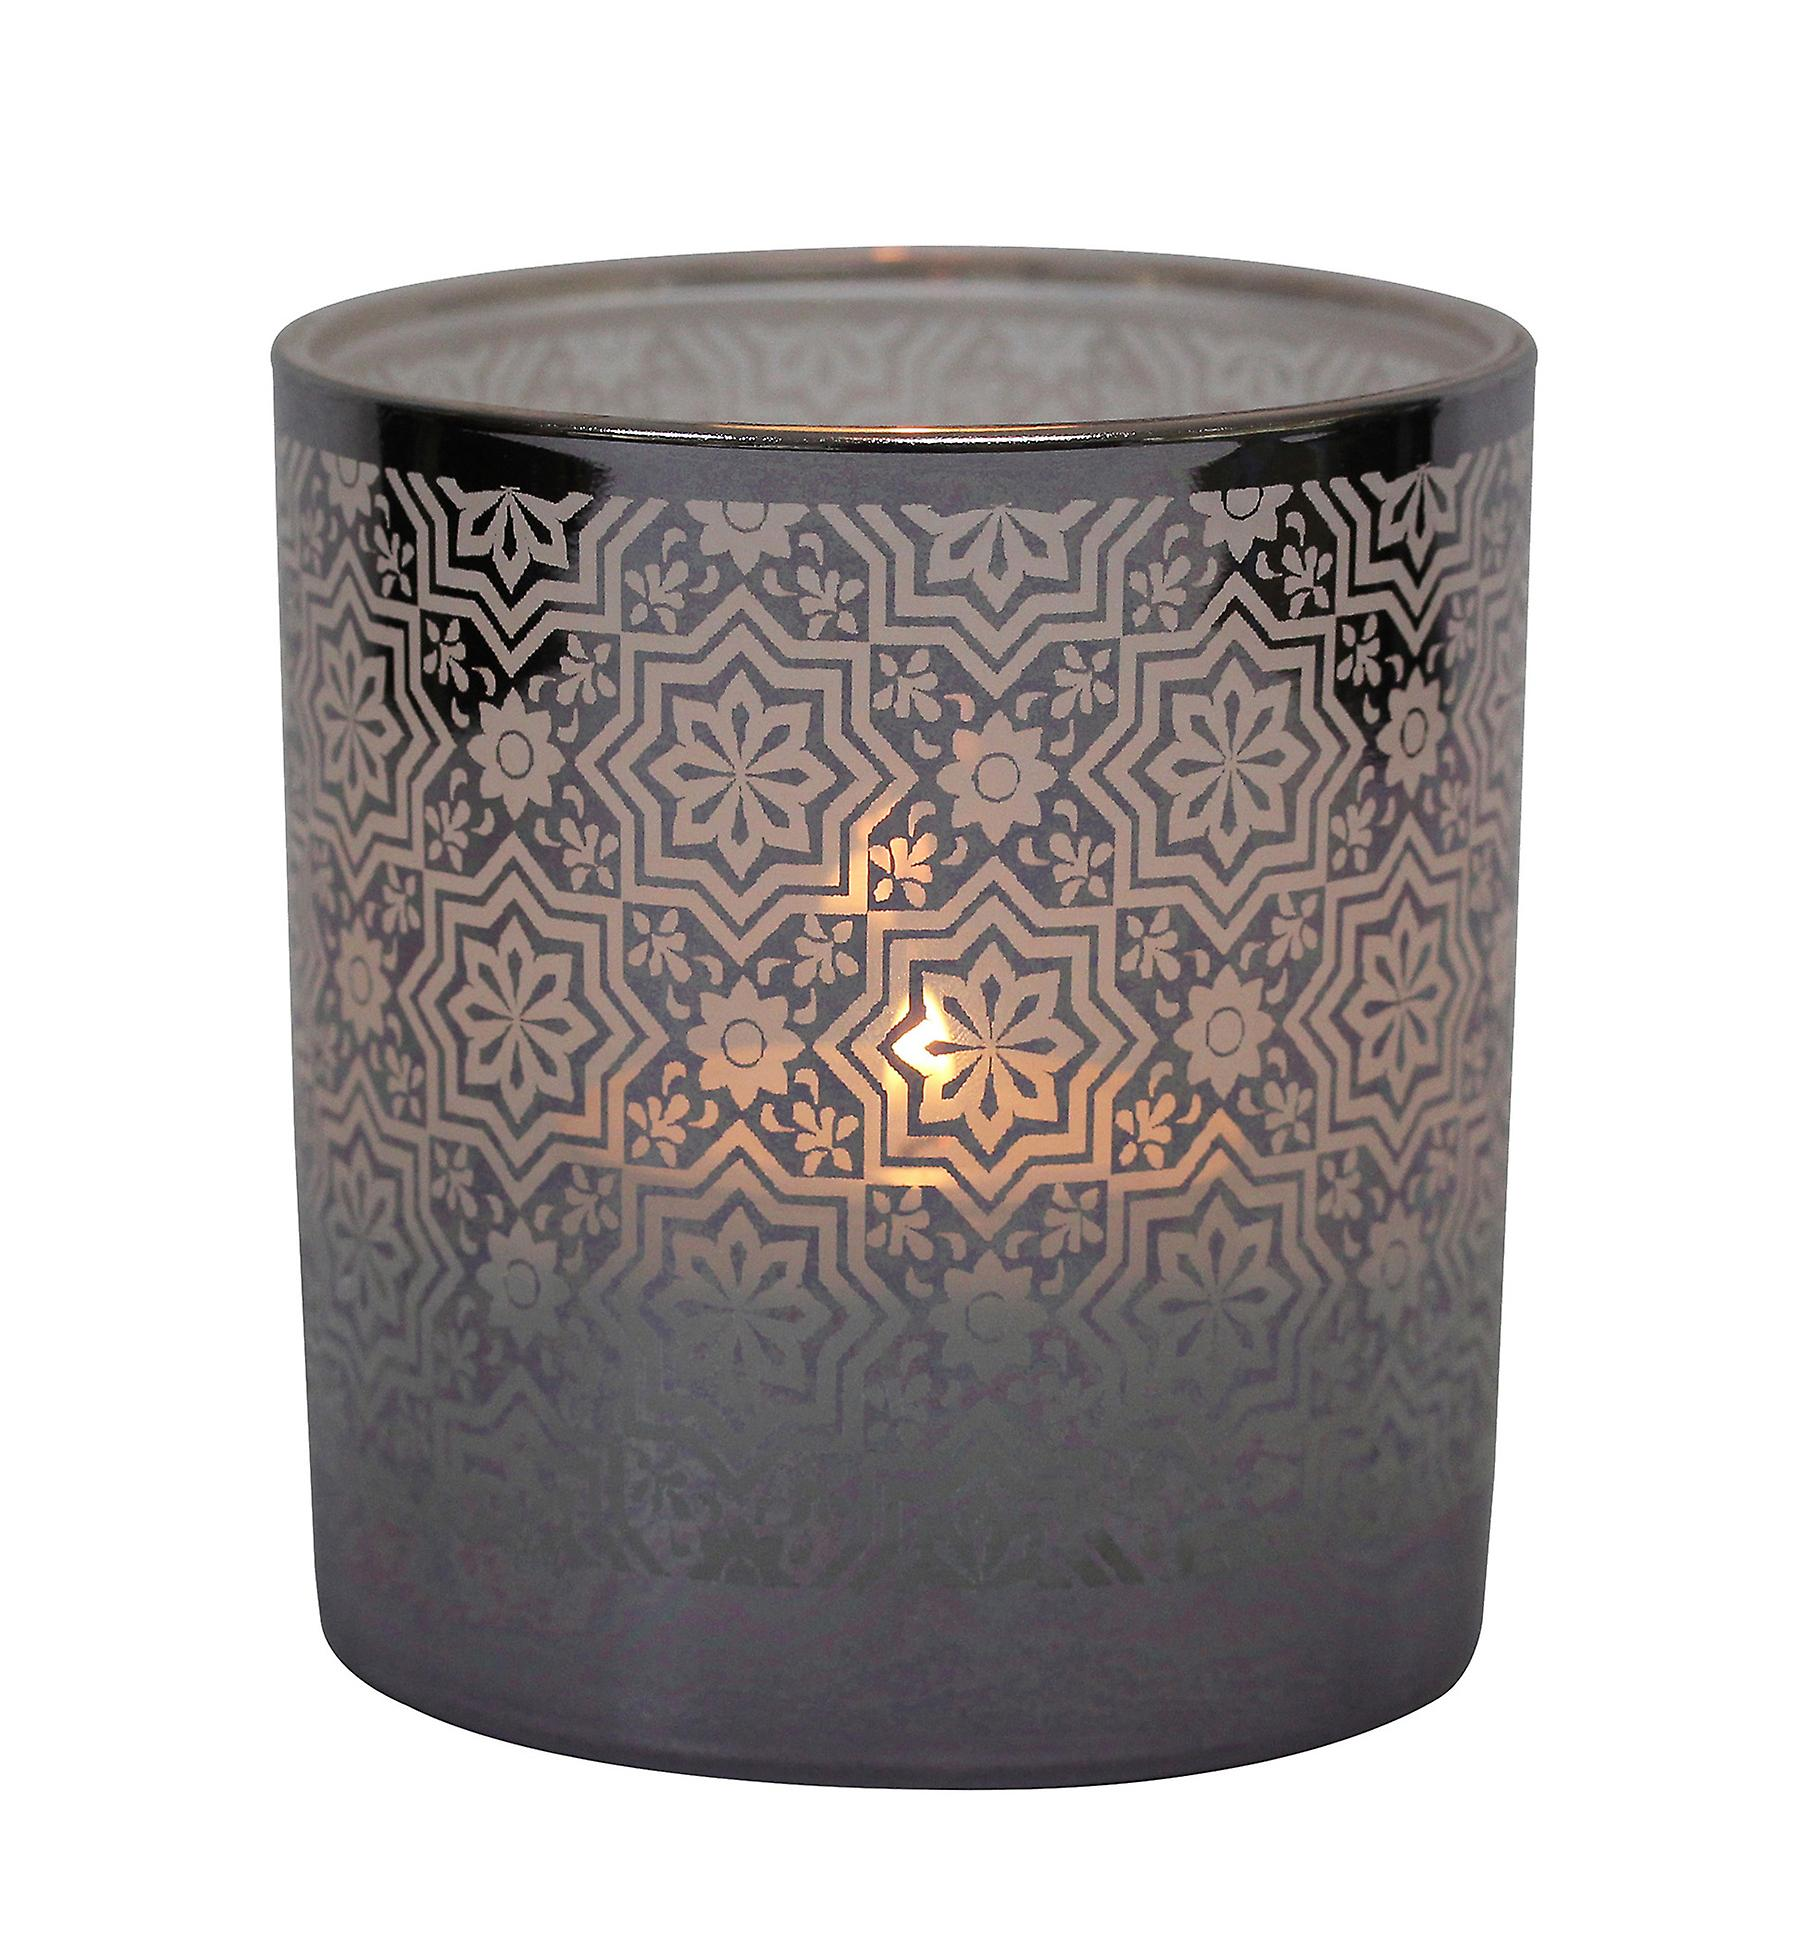 Table Tech Cordoba Glass Votive Candle Holder, Silver